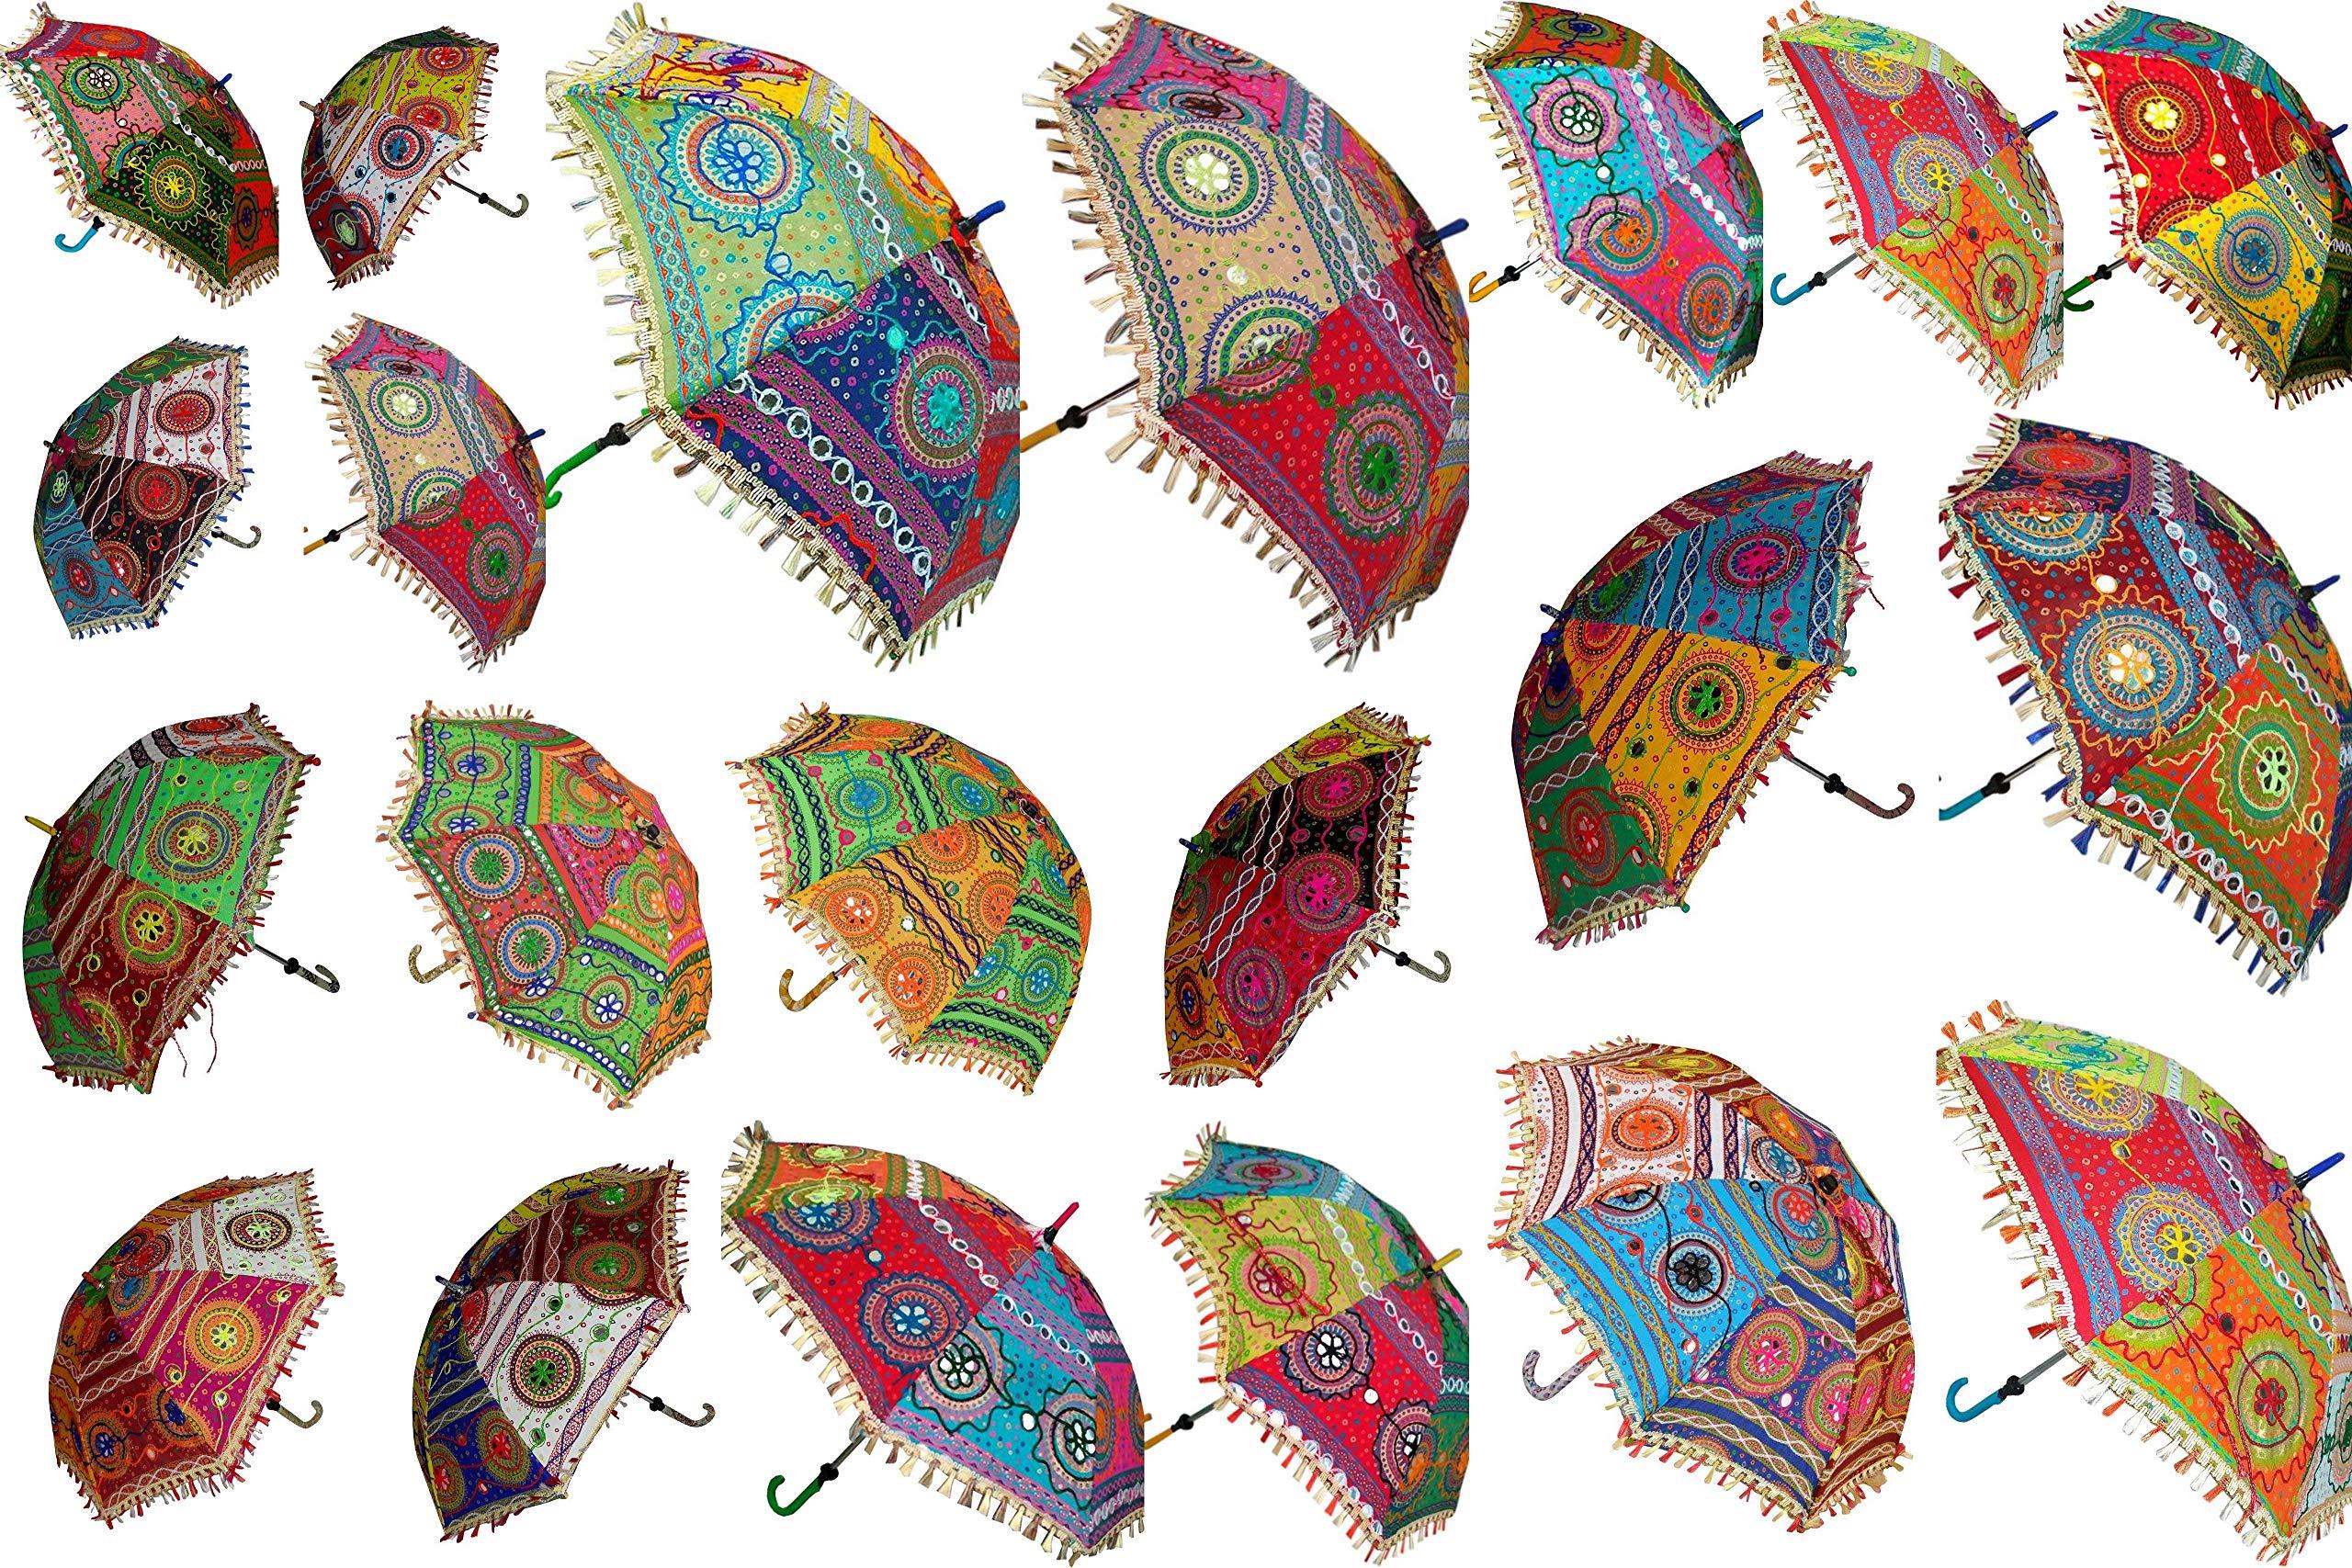 15 Pcs Mix Lot Indian Wedding Umbrella Handmade Embroidery Umbrella Decorations Mirror Work Vintage Parasols Cotton Umbrellas by Worldoftextile